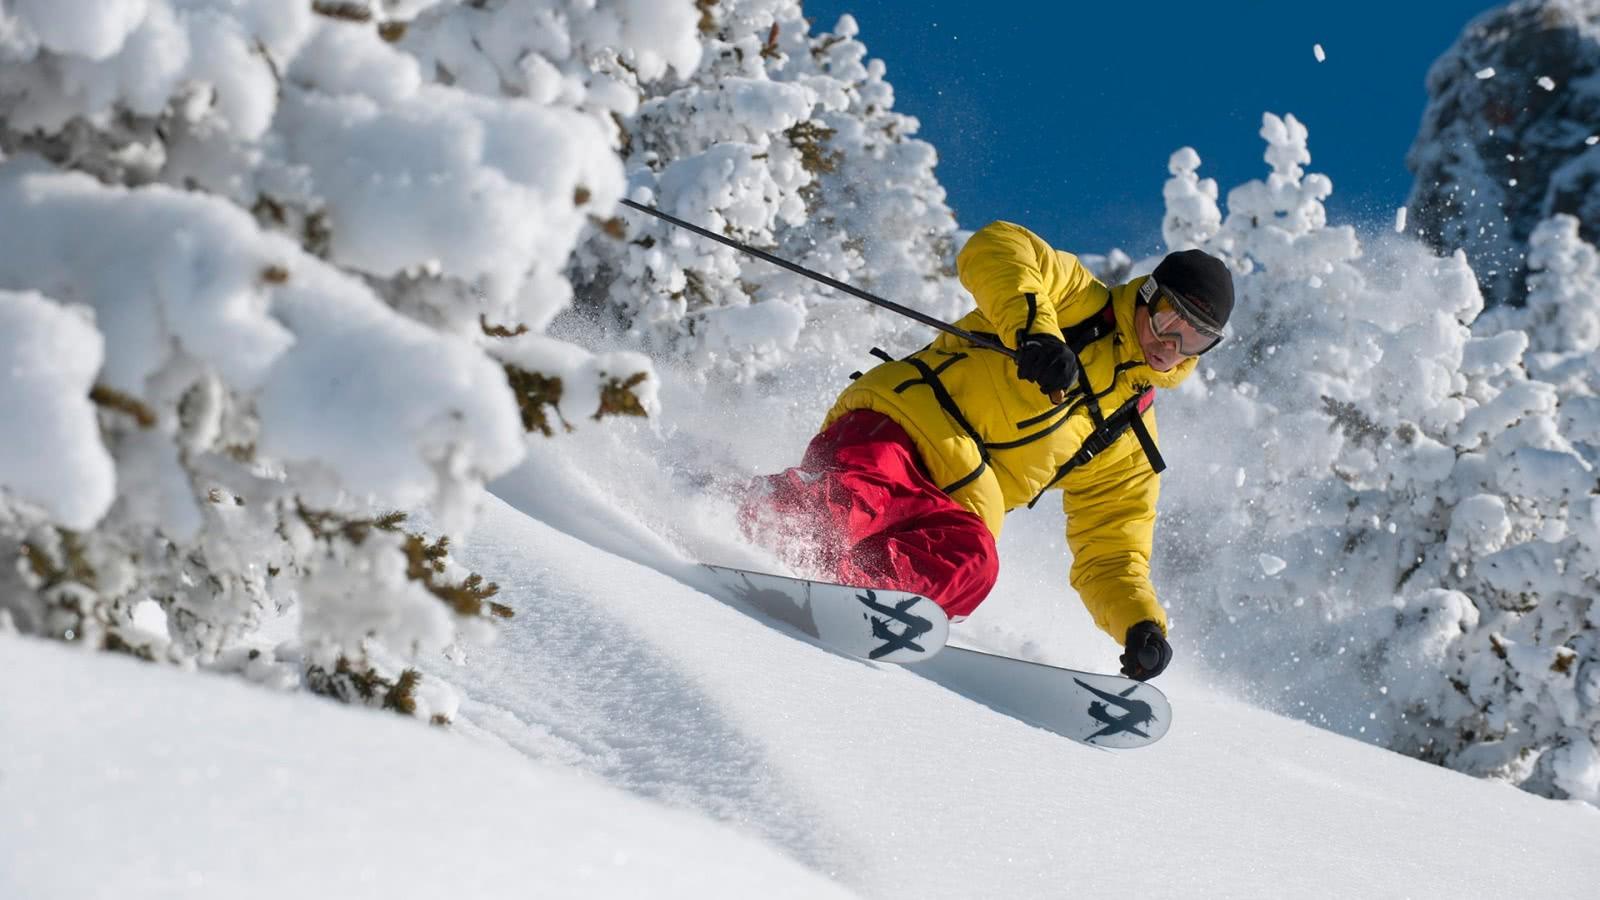 Ski hors piste aux Arcs - Tarentaise Vanoise (73)